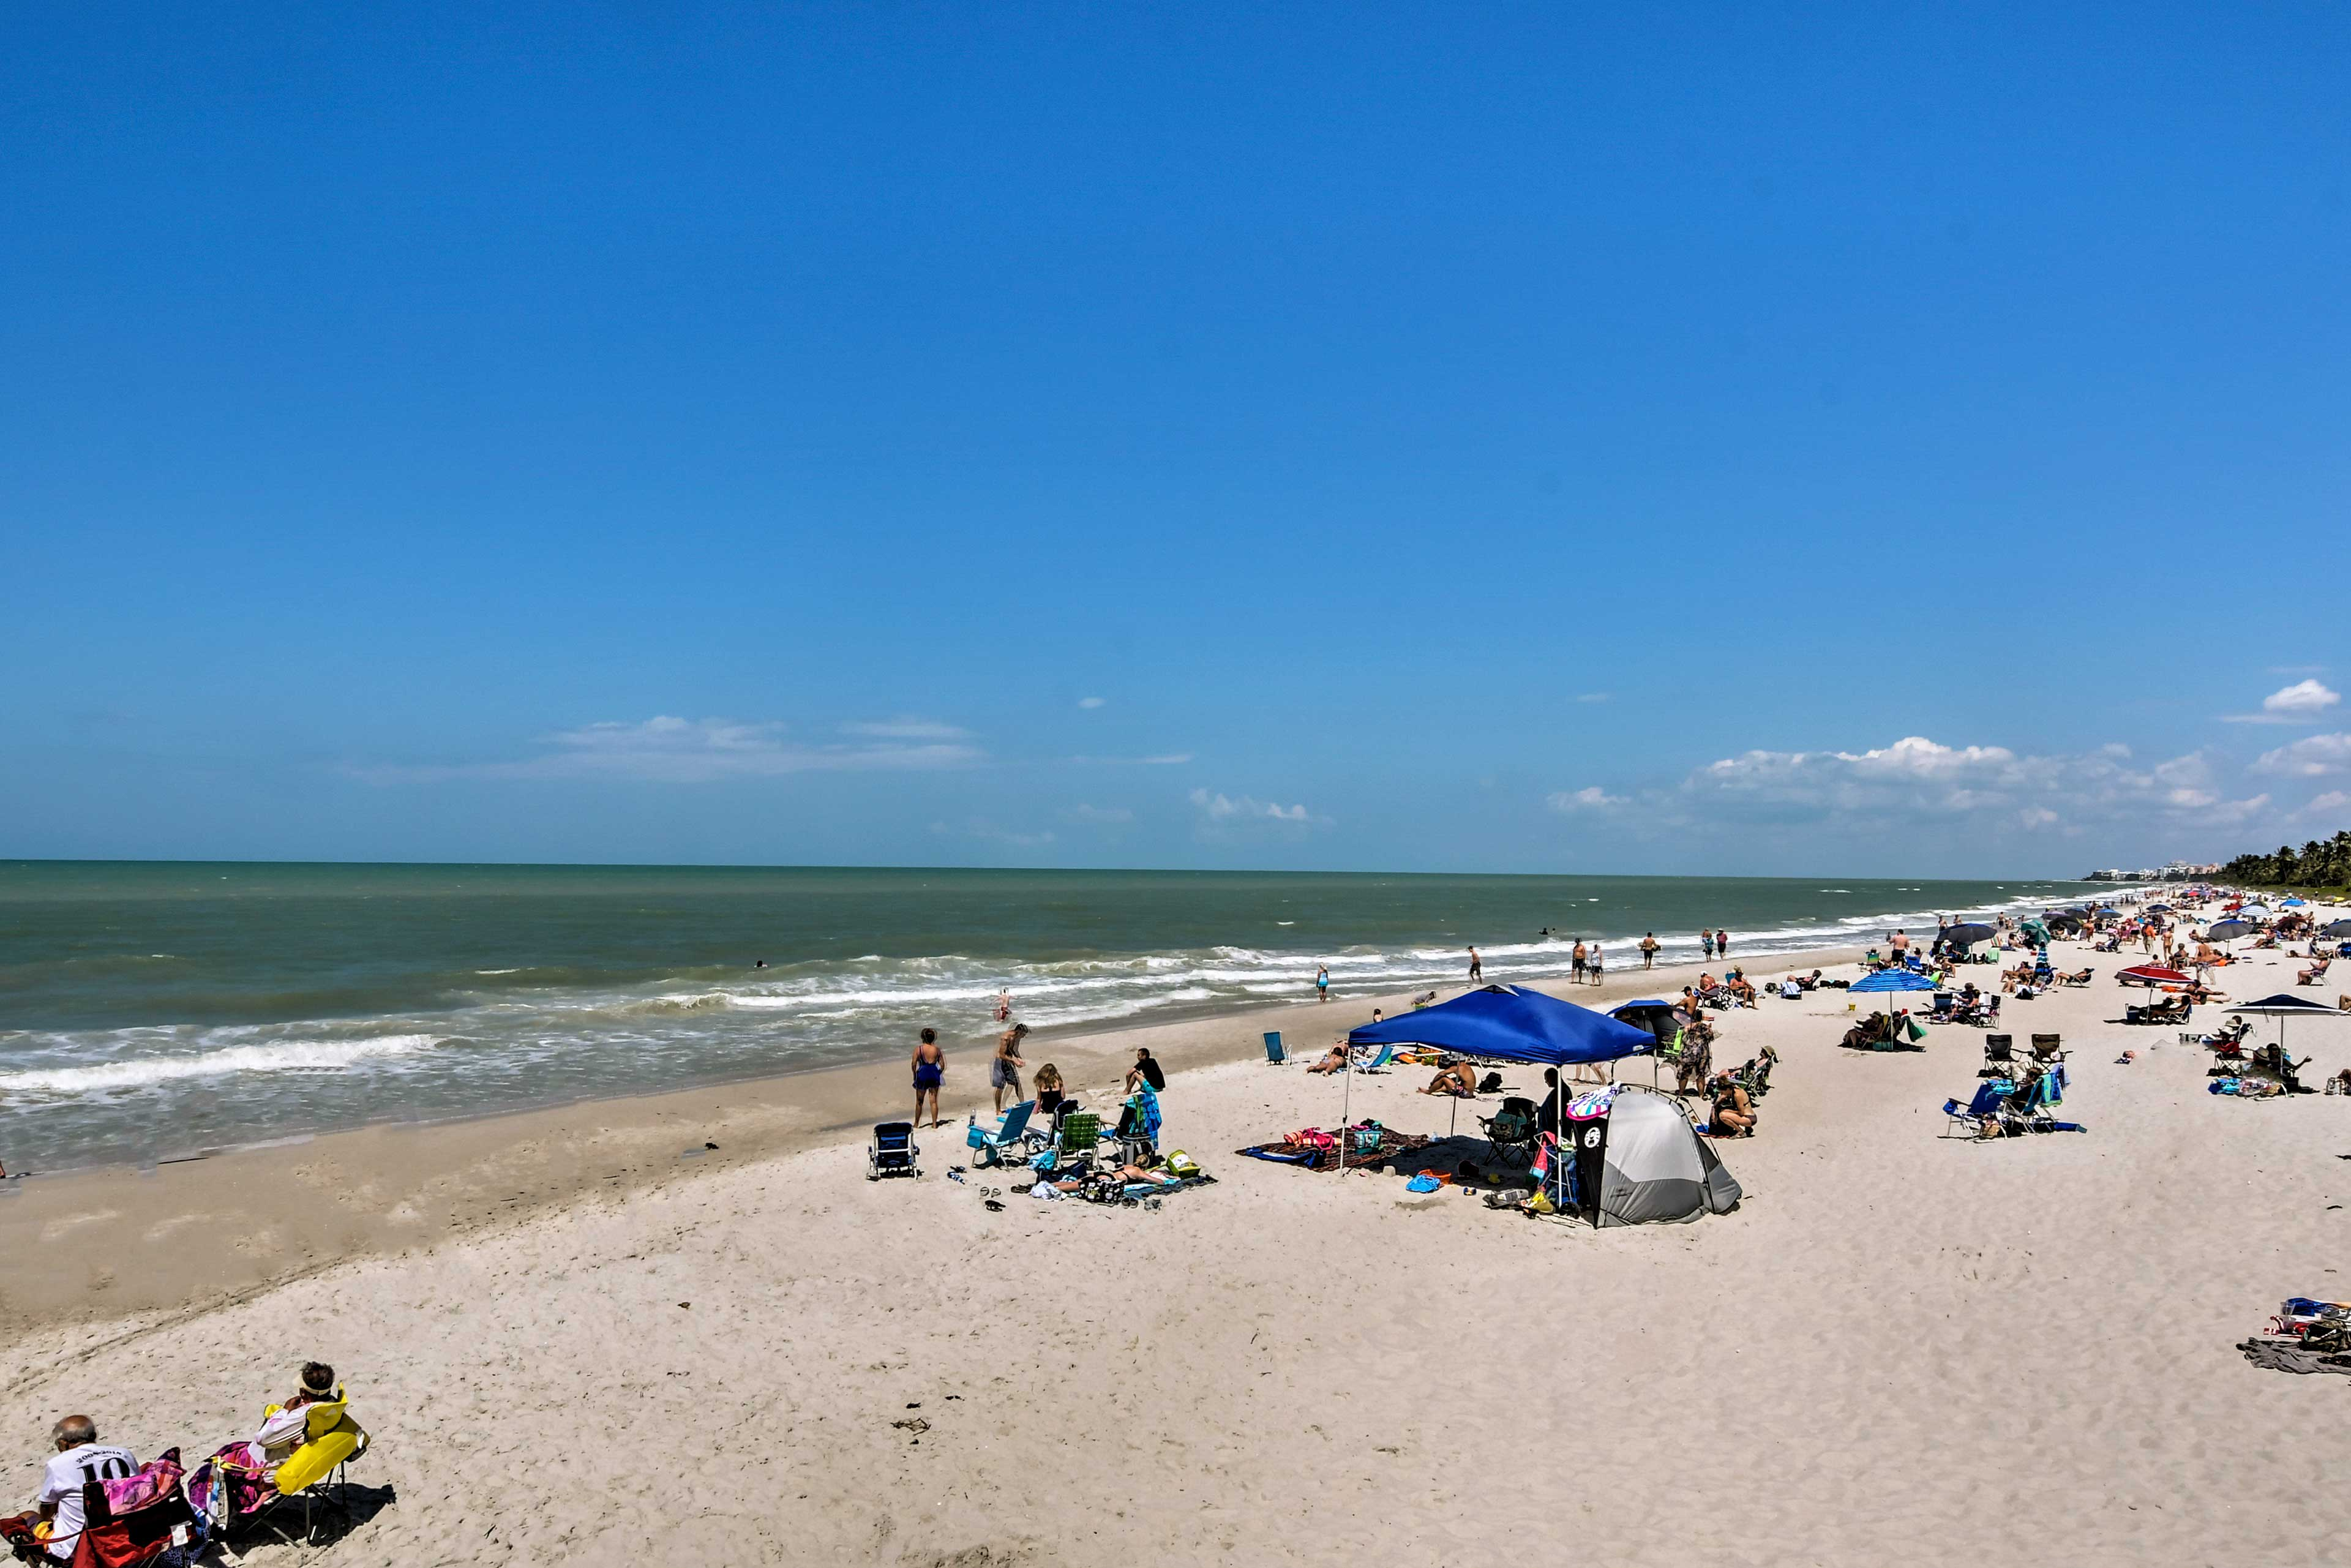 Sunny Florida days await.